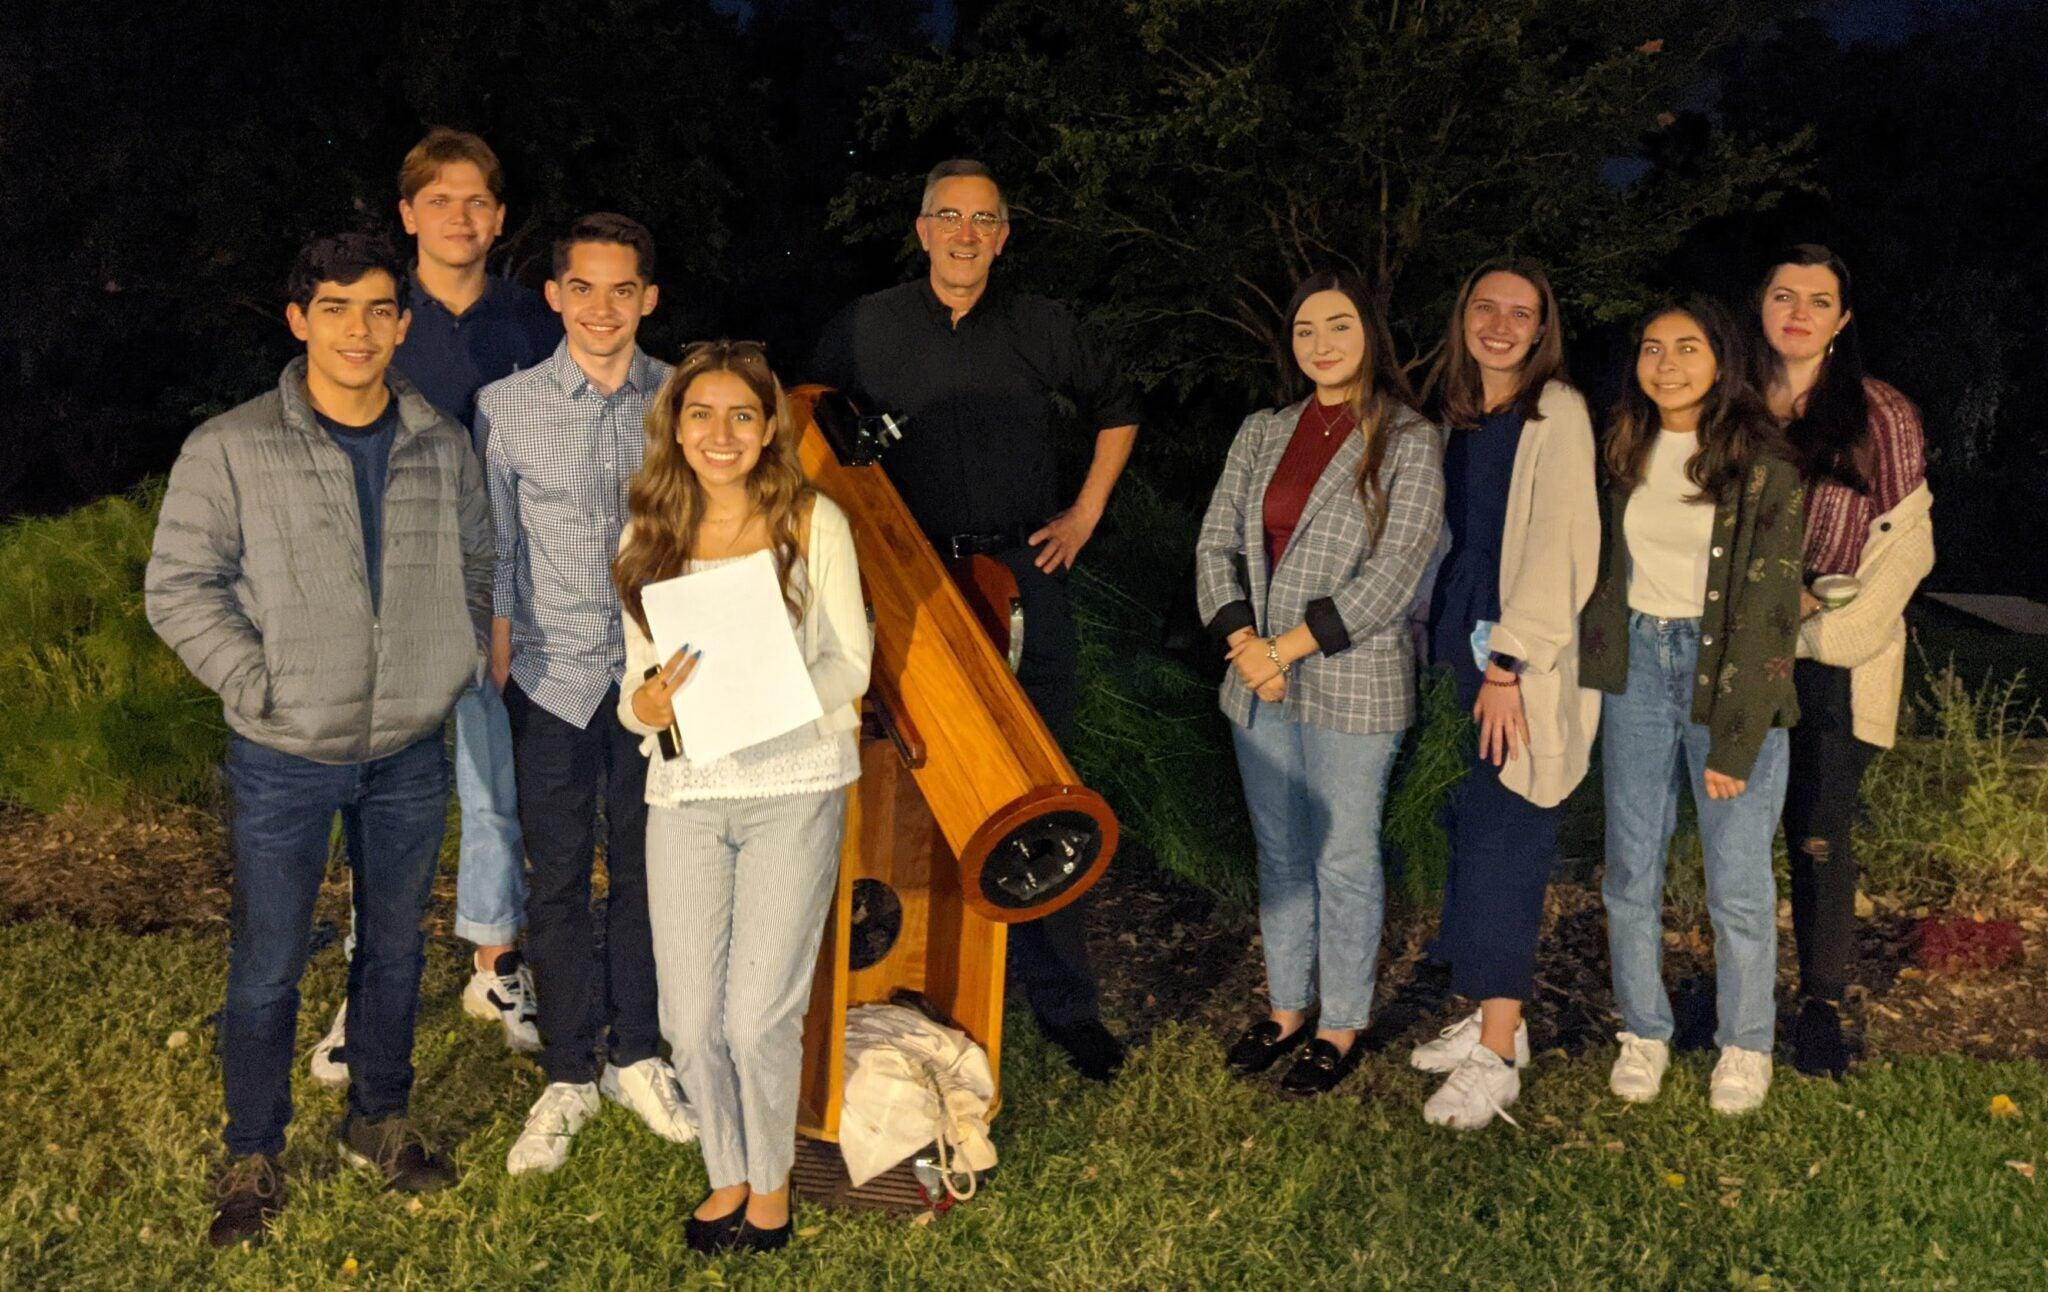 After Dinner Stargazing: Rodrigo, Andrii, Juan Pablo, Mariana, Fr. Collins & his telescope, Mailí, Kenzie, Jess, Colleen